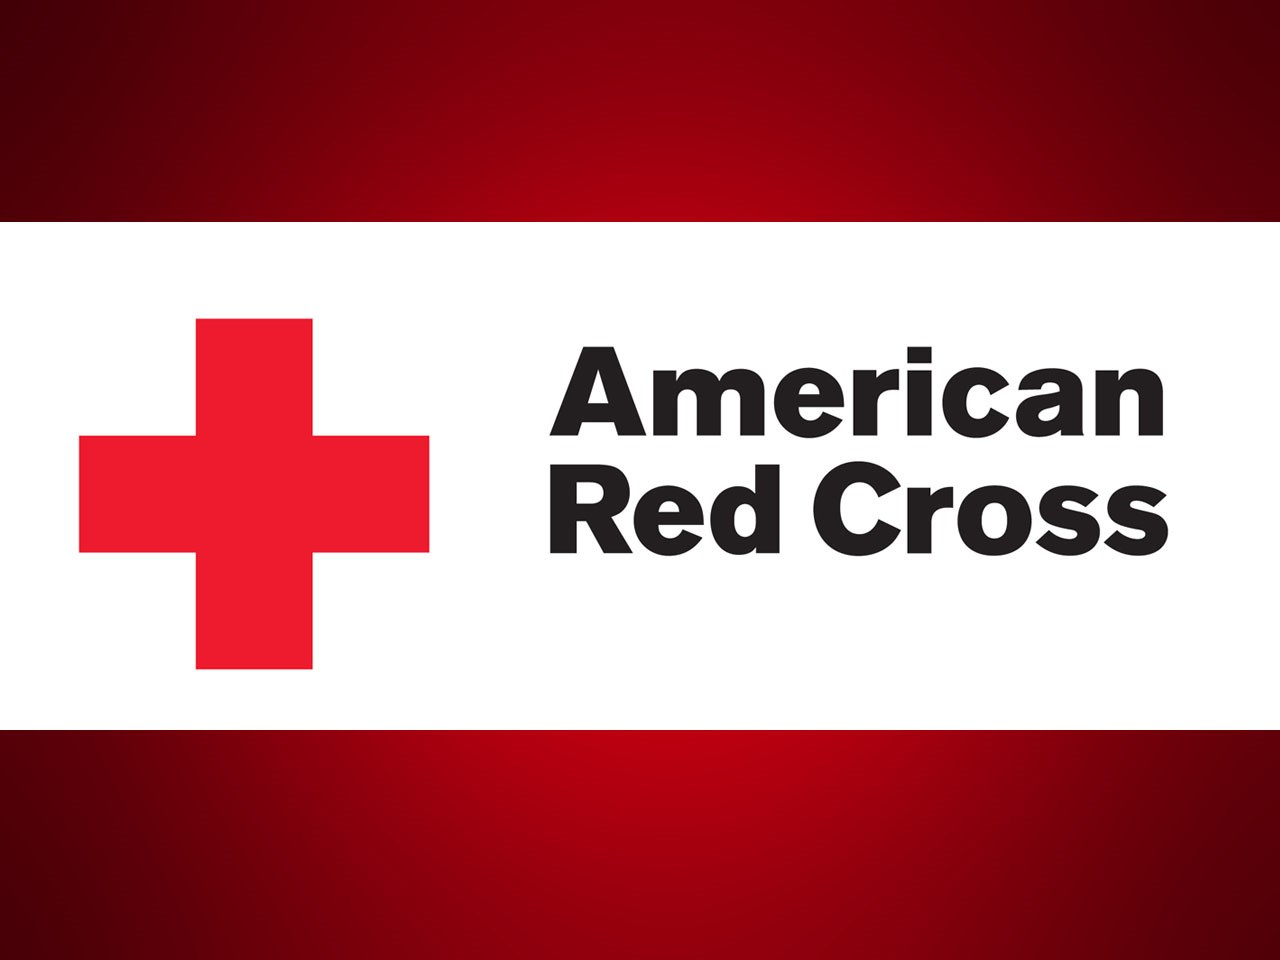 American Red Cross_1457388533298.jpg